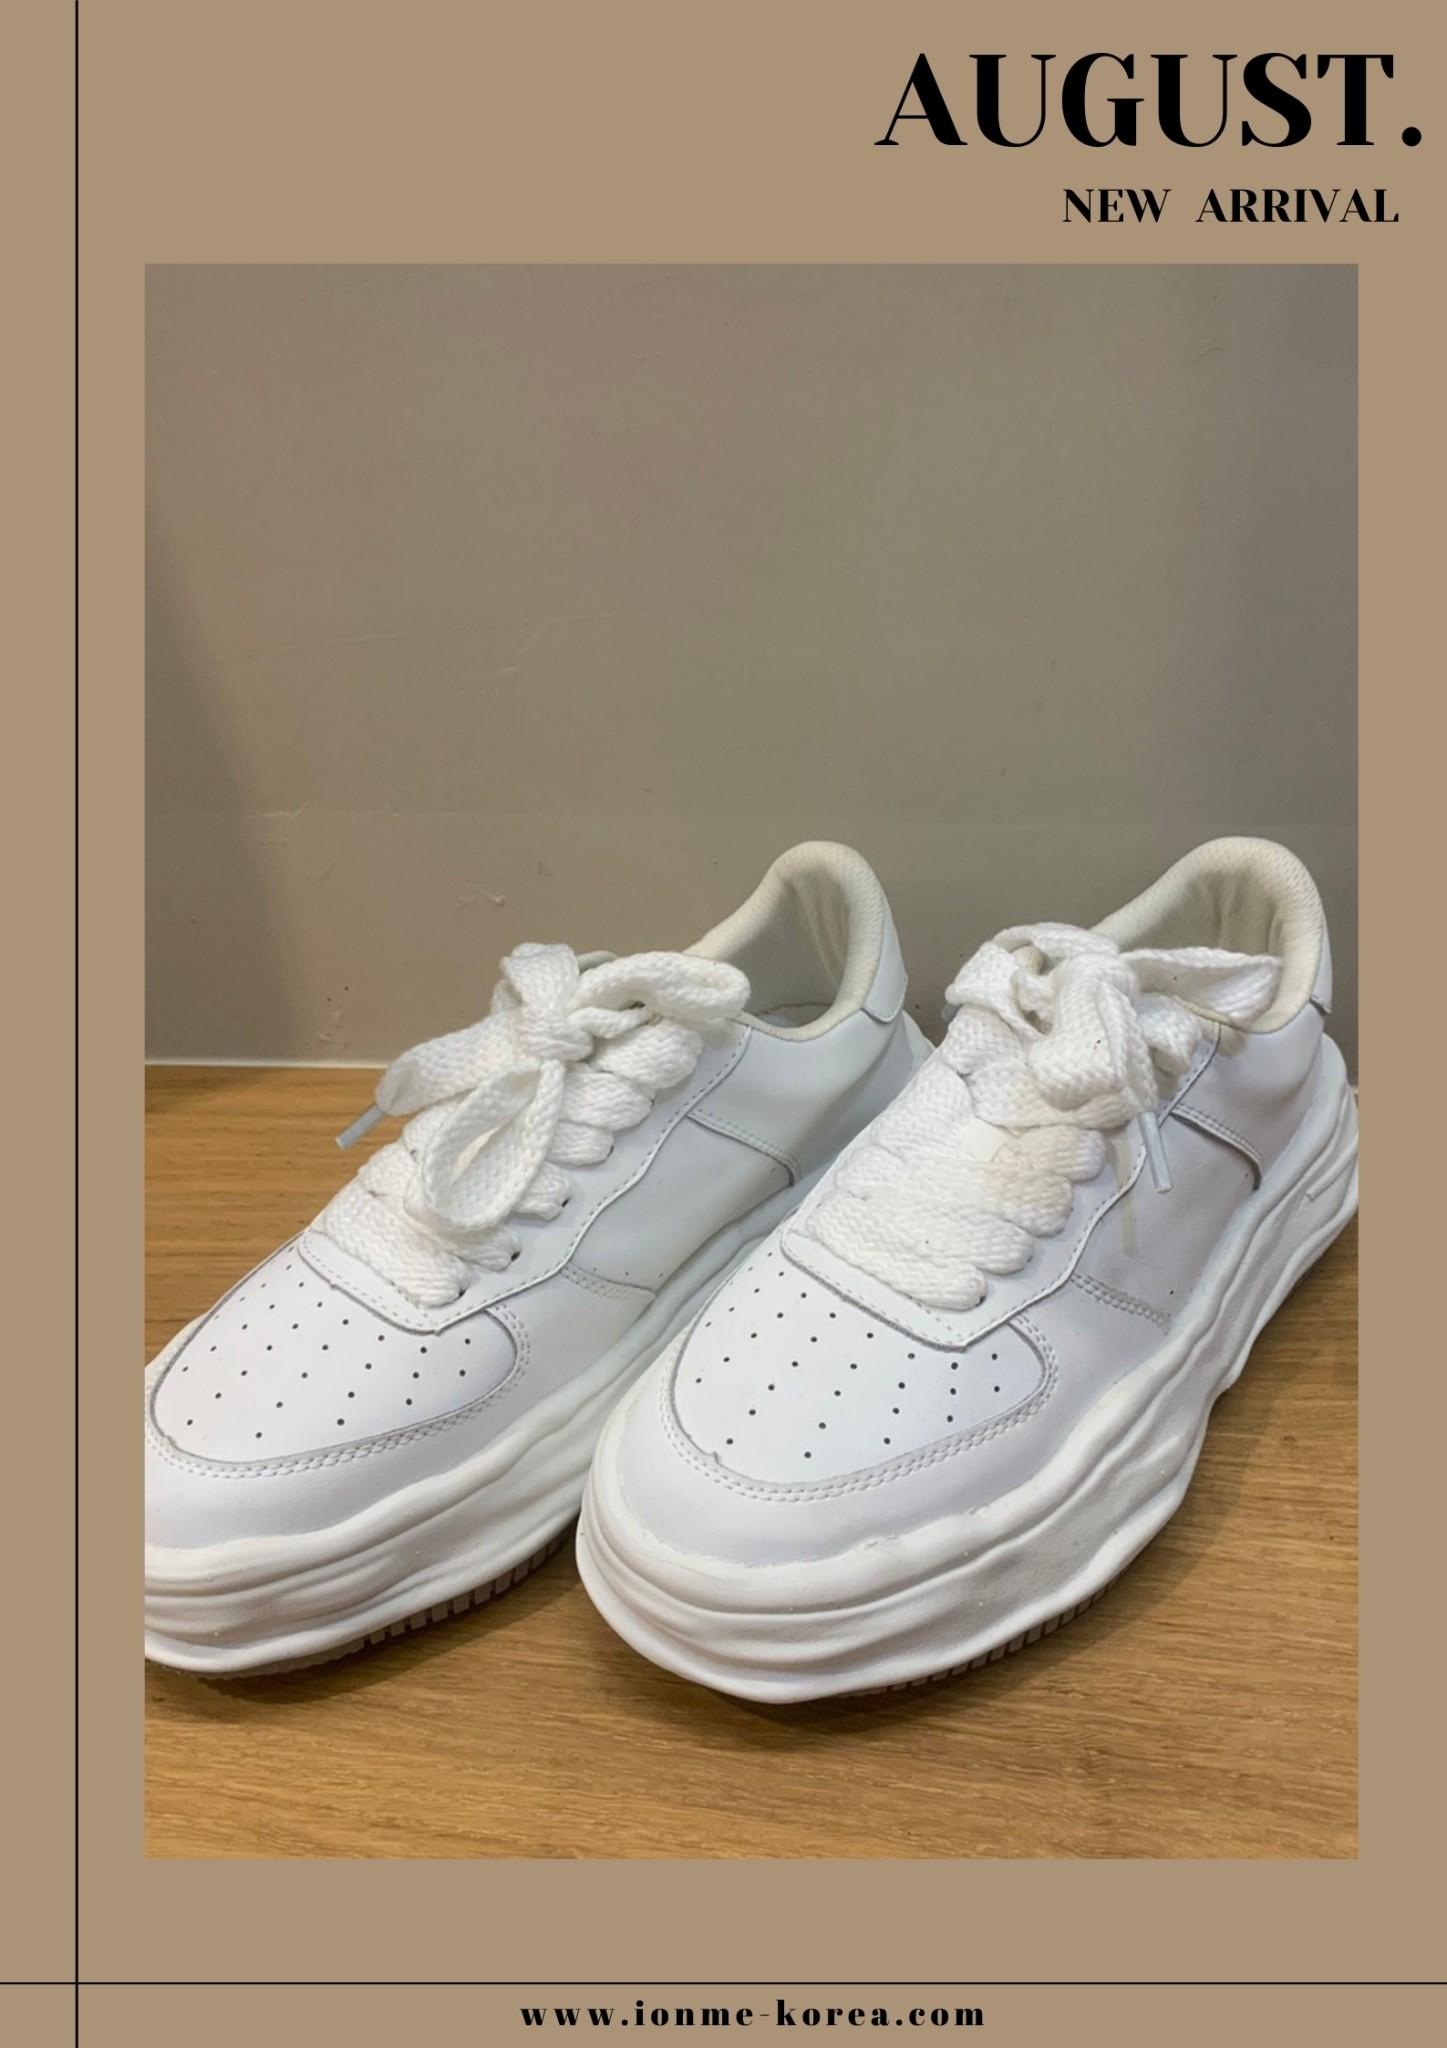 A78翻玩溶化白布鞋(白)(24)